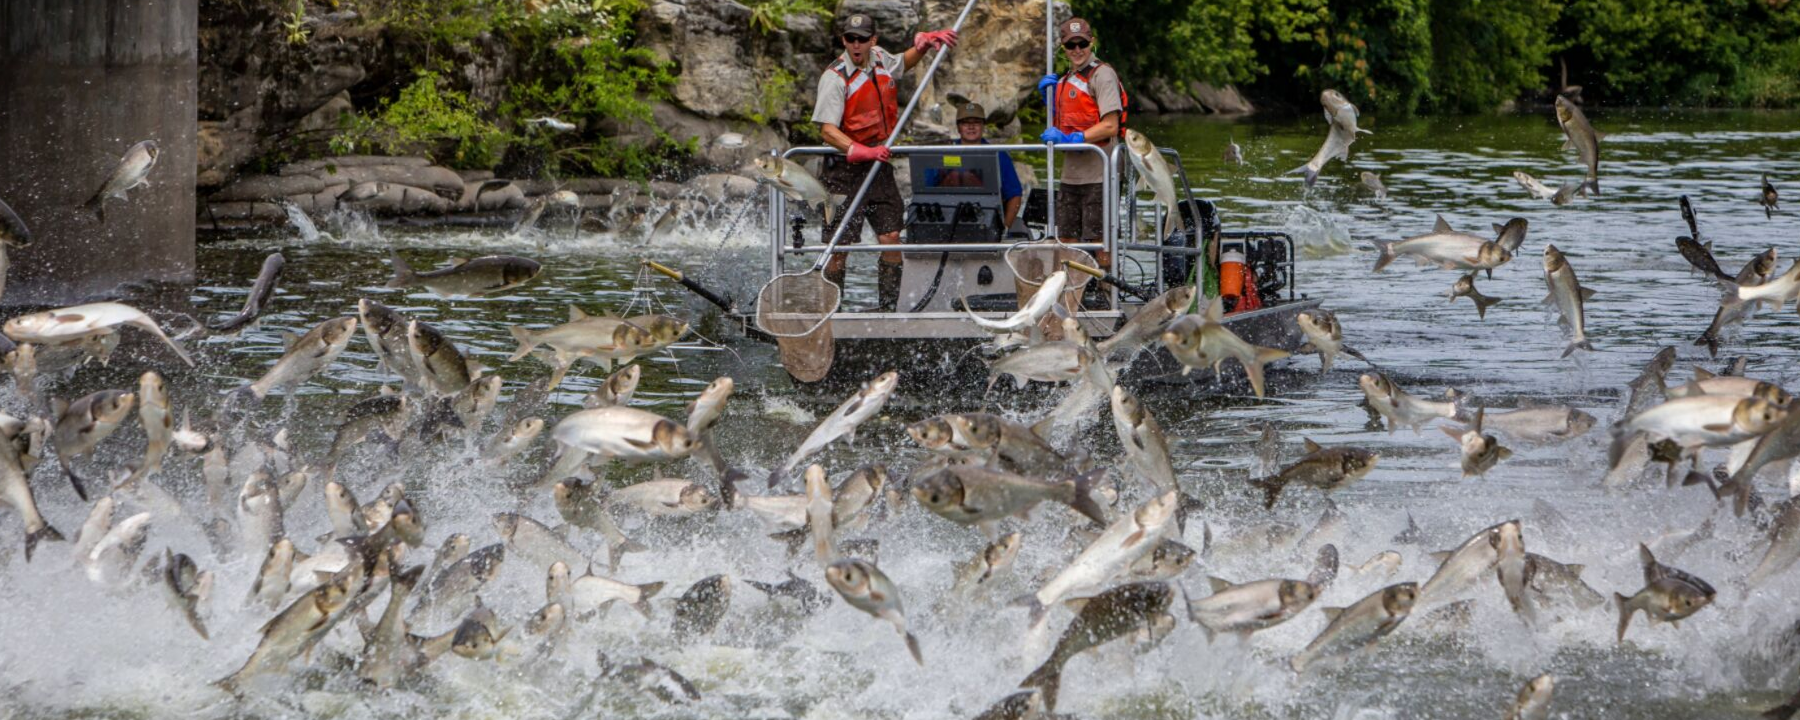 Invasive Carp Could Spread Across Lake Michigan on Detritus Diet